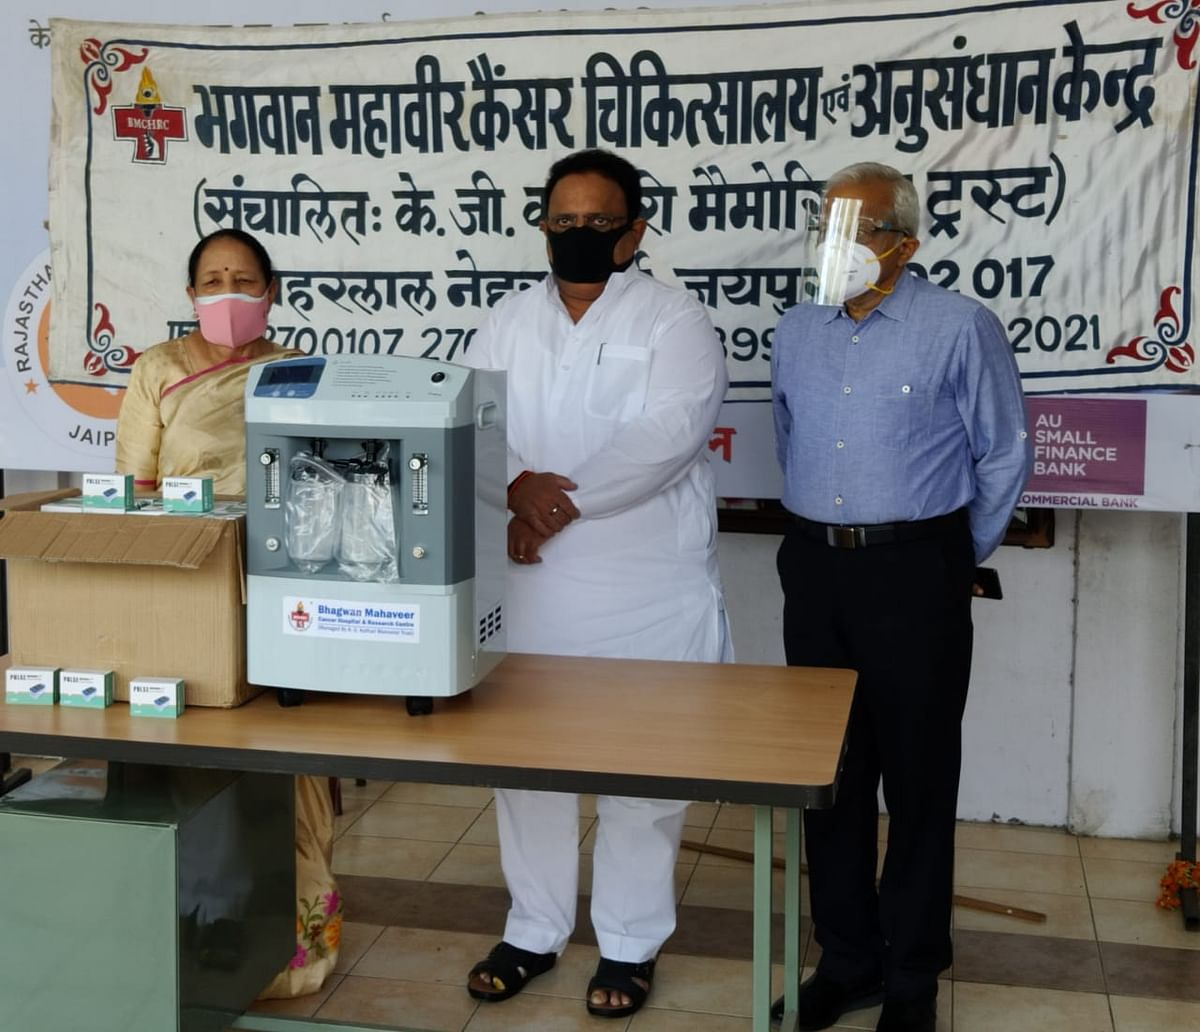 bhagwan-mahaveer-cancer-hospital-provided-20-oxygen-concentrators